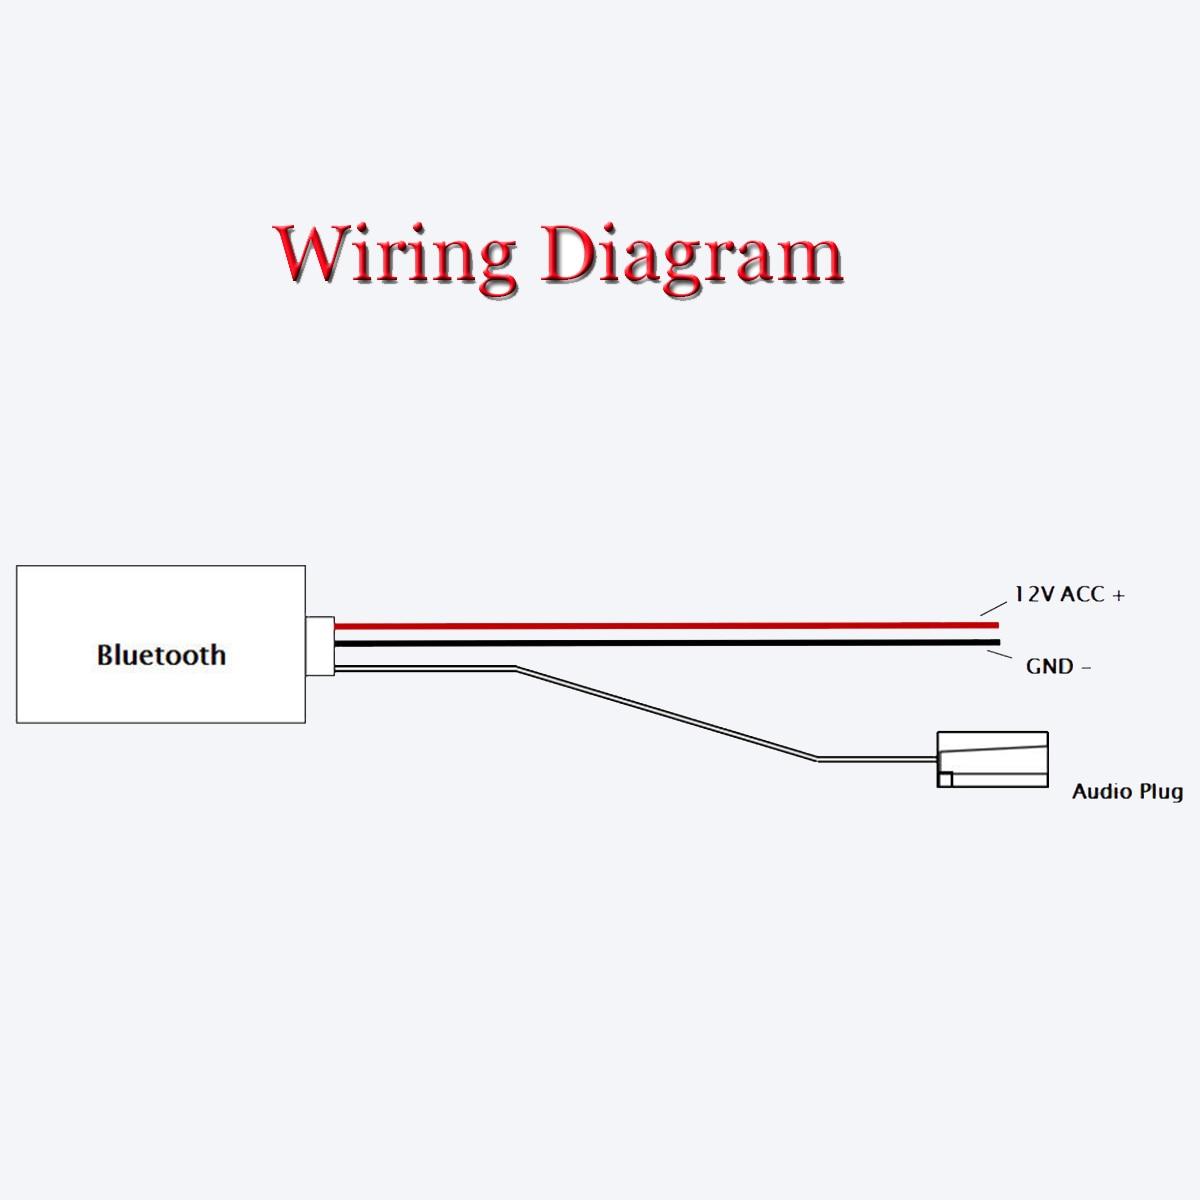 aux cable wiring diagram wiring diagram origin earbud wiring diagram pioneer aux cable wiring diagram [ 1200 x 1200 Pixel ]